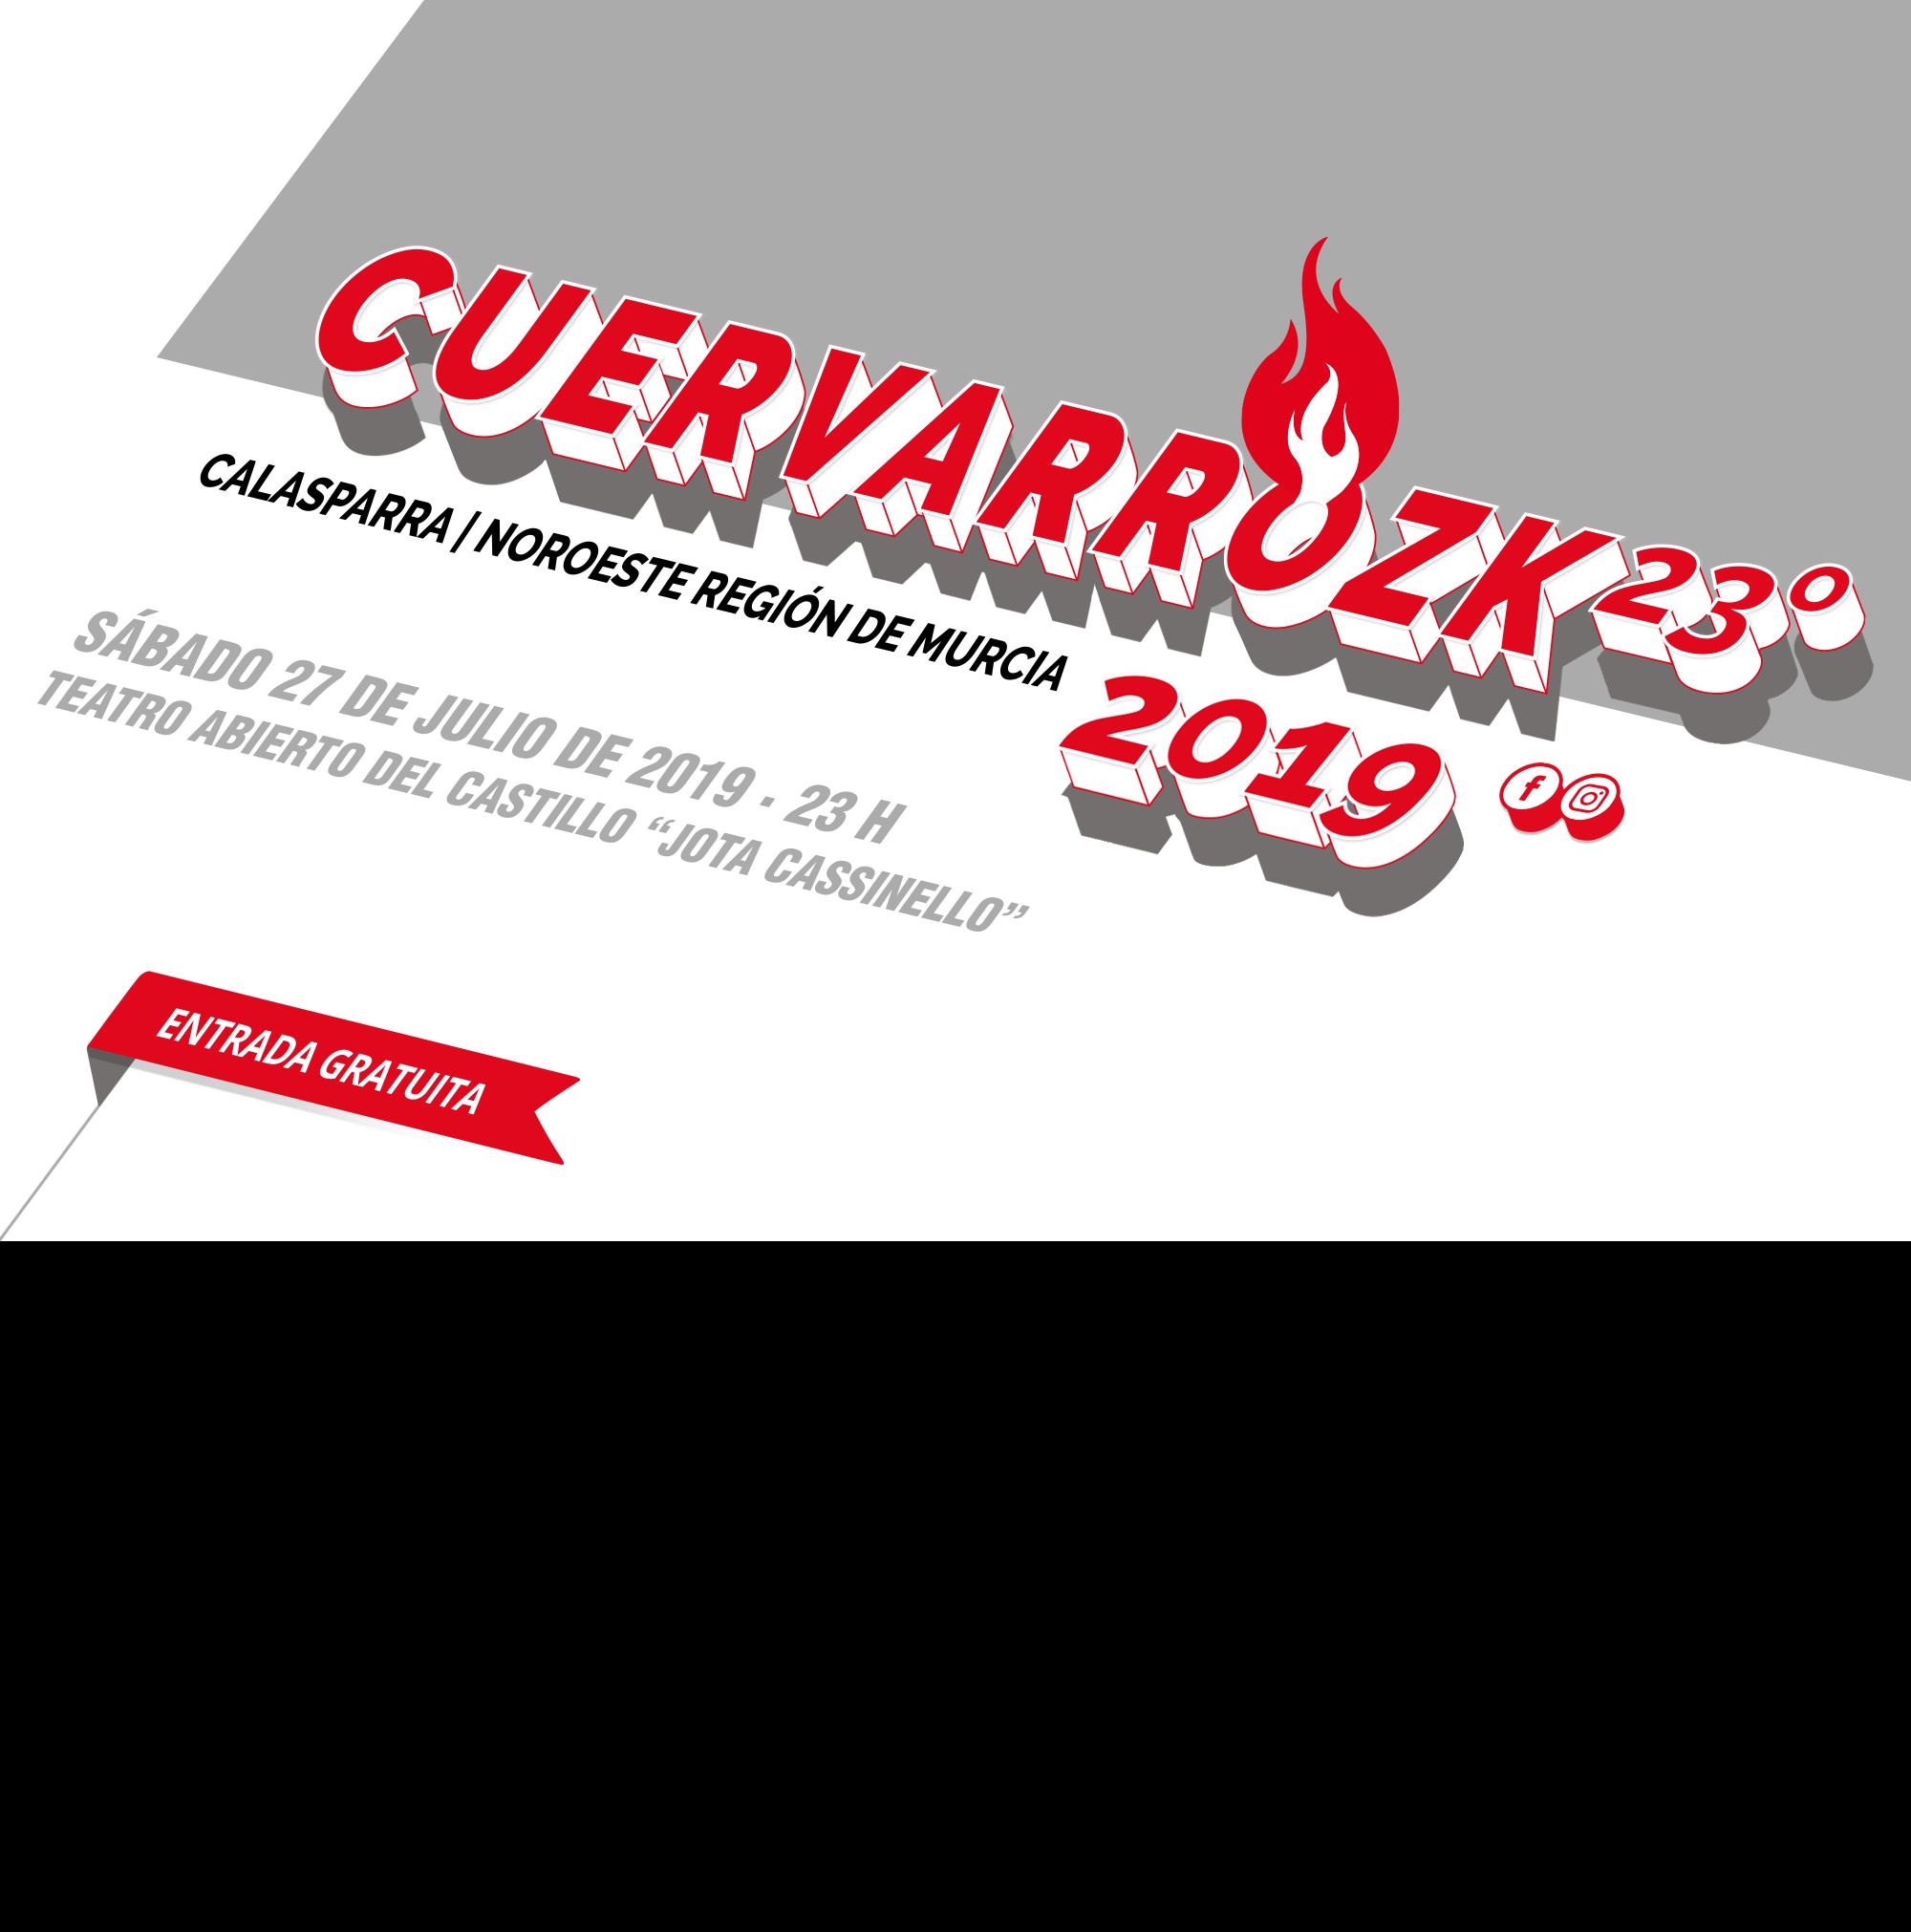 CUERVARROZK 2019 · 23º